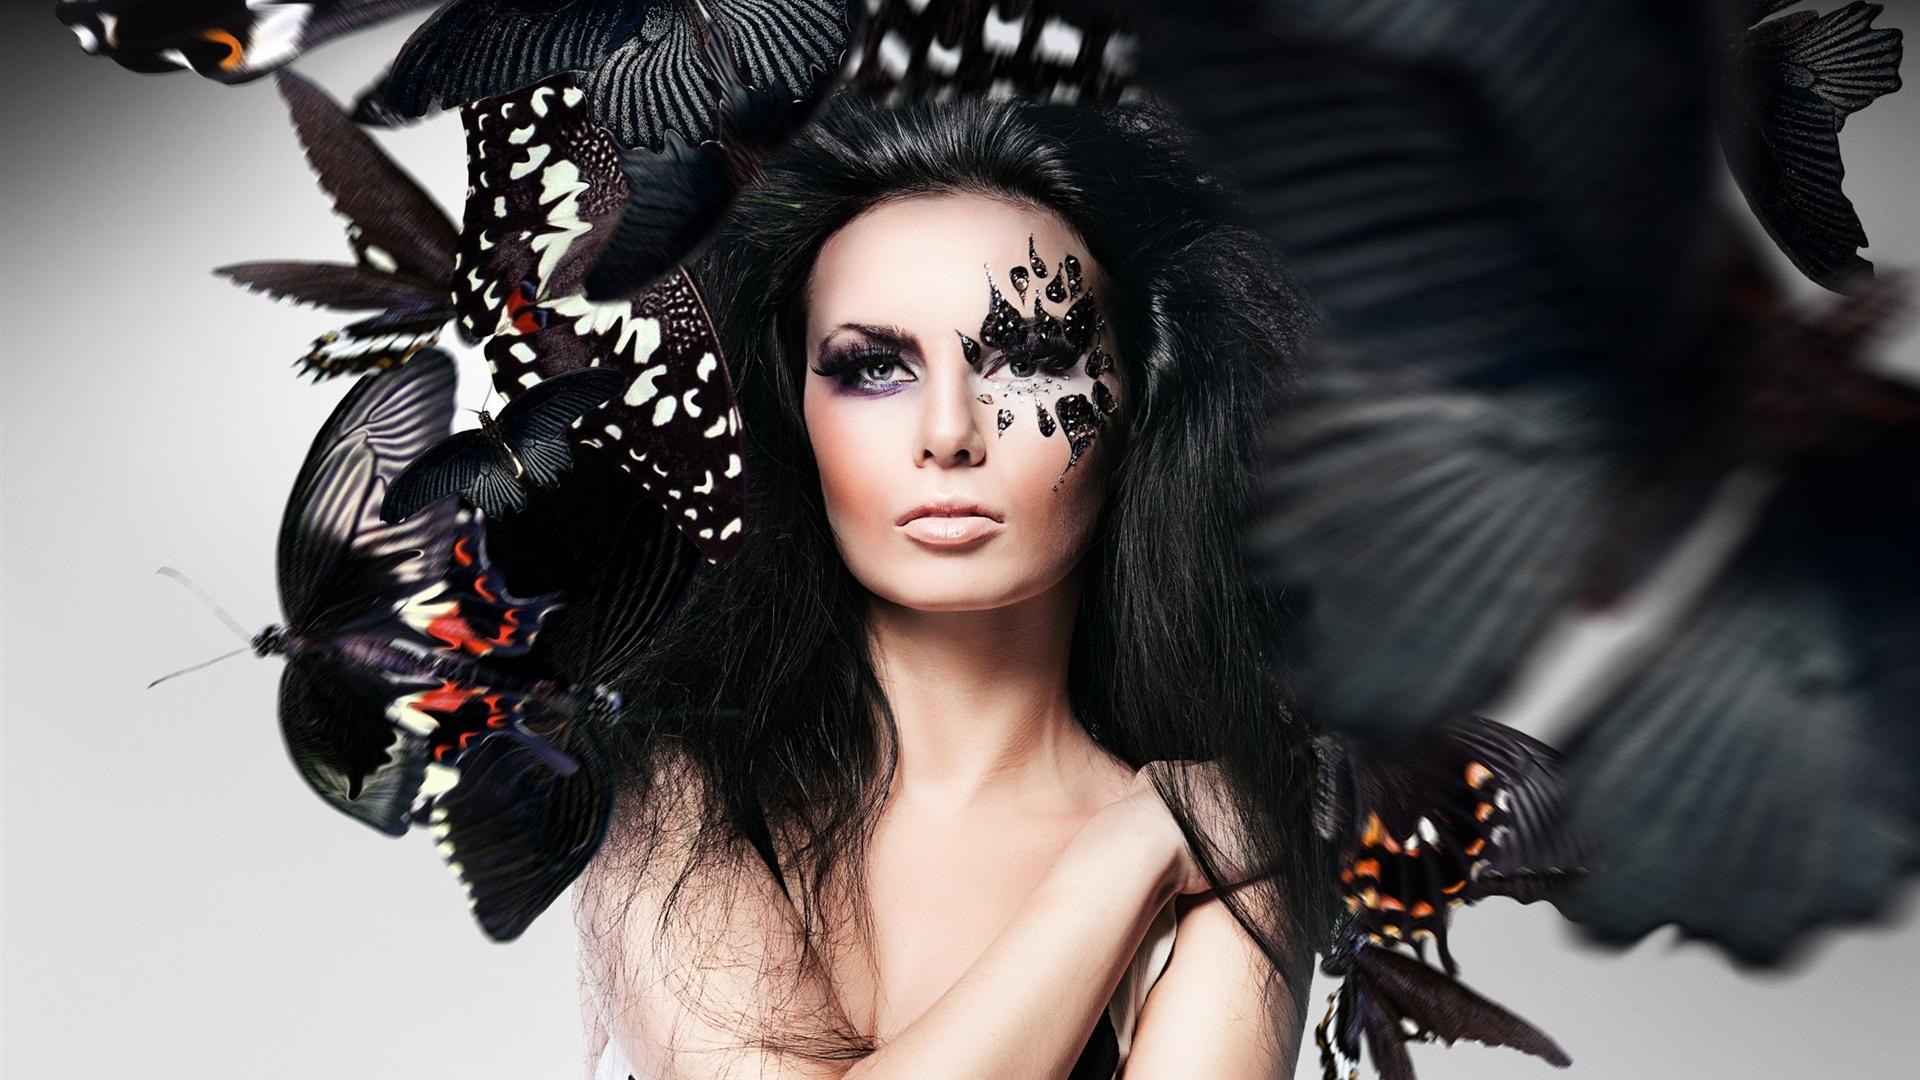 http://4.bp.blogspot.com/-Jyfl5_r1SYE/UOpWzAB7r3I/AAAAAAAAUB8/yAIHKFbjY_s/s0/Girl-makeup-face-butterfly-Photoshop-creative-design-1920x1080.jpg